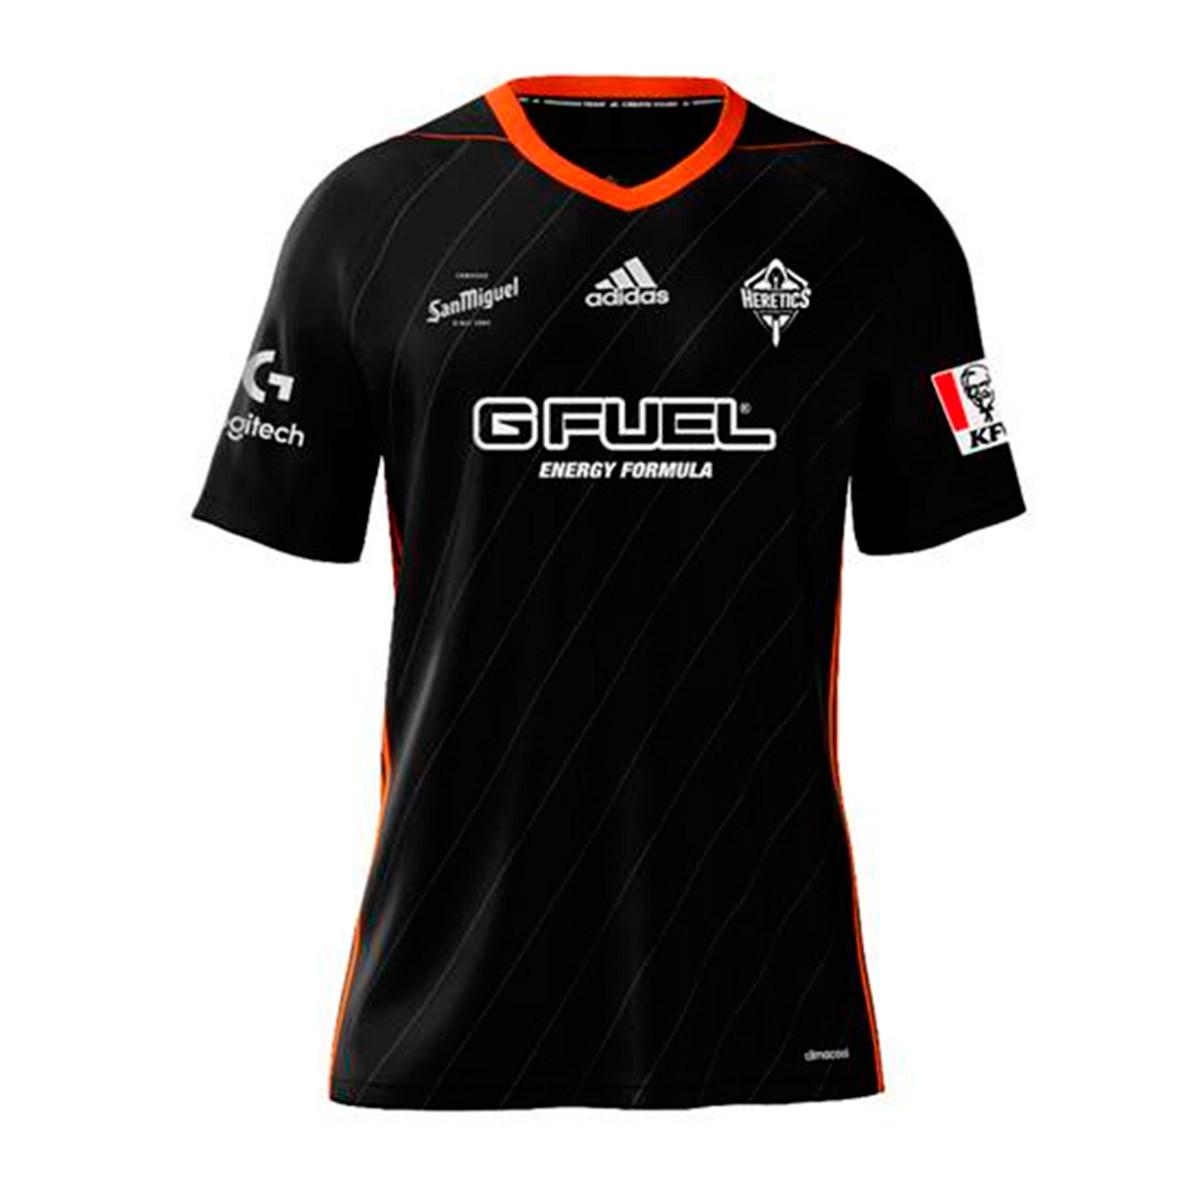 Aleta tornillo Triplicar  Camiseta adidas Heretics 2019 Black - Tienda de fútbol Fútbol Emotion